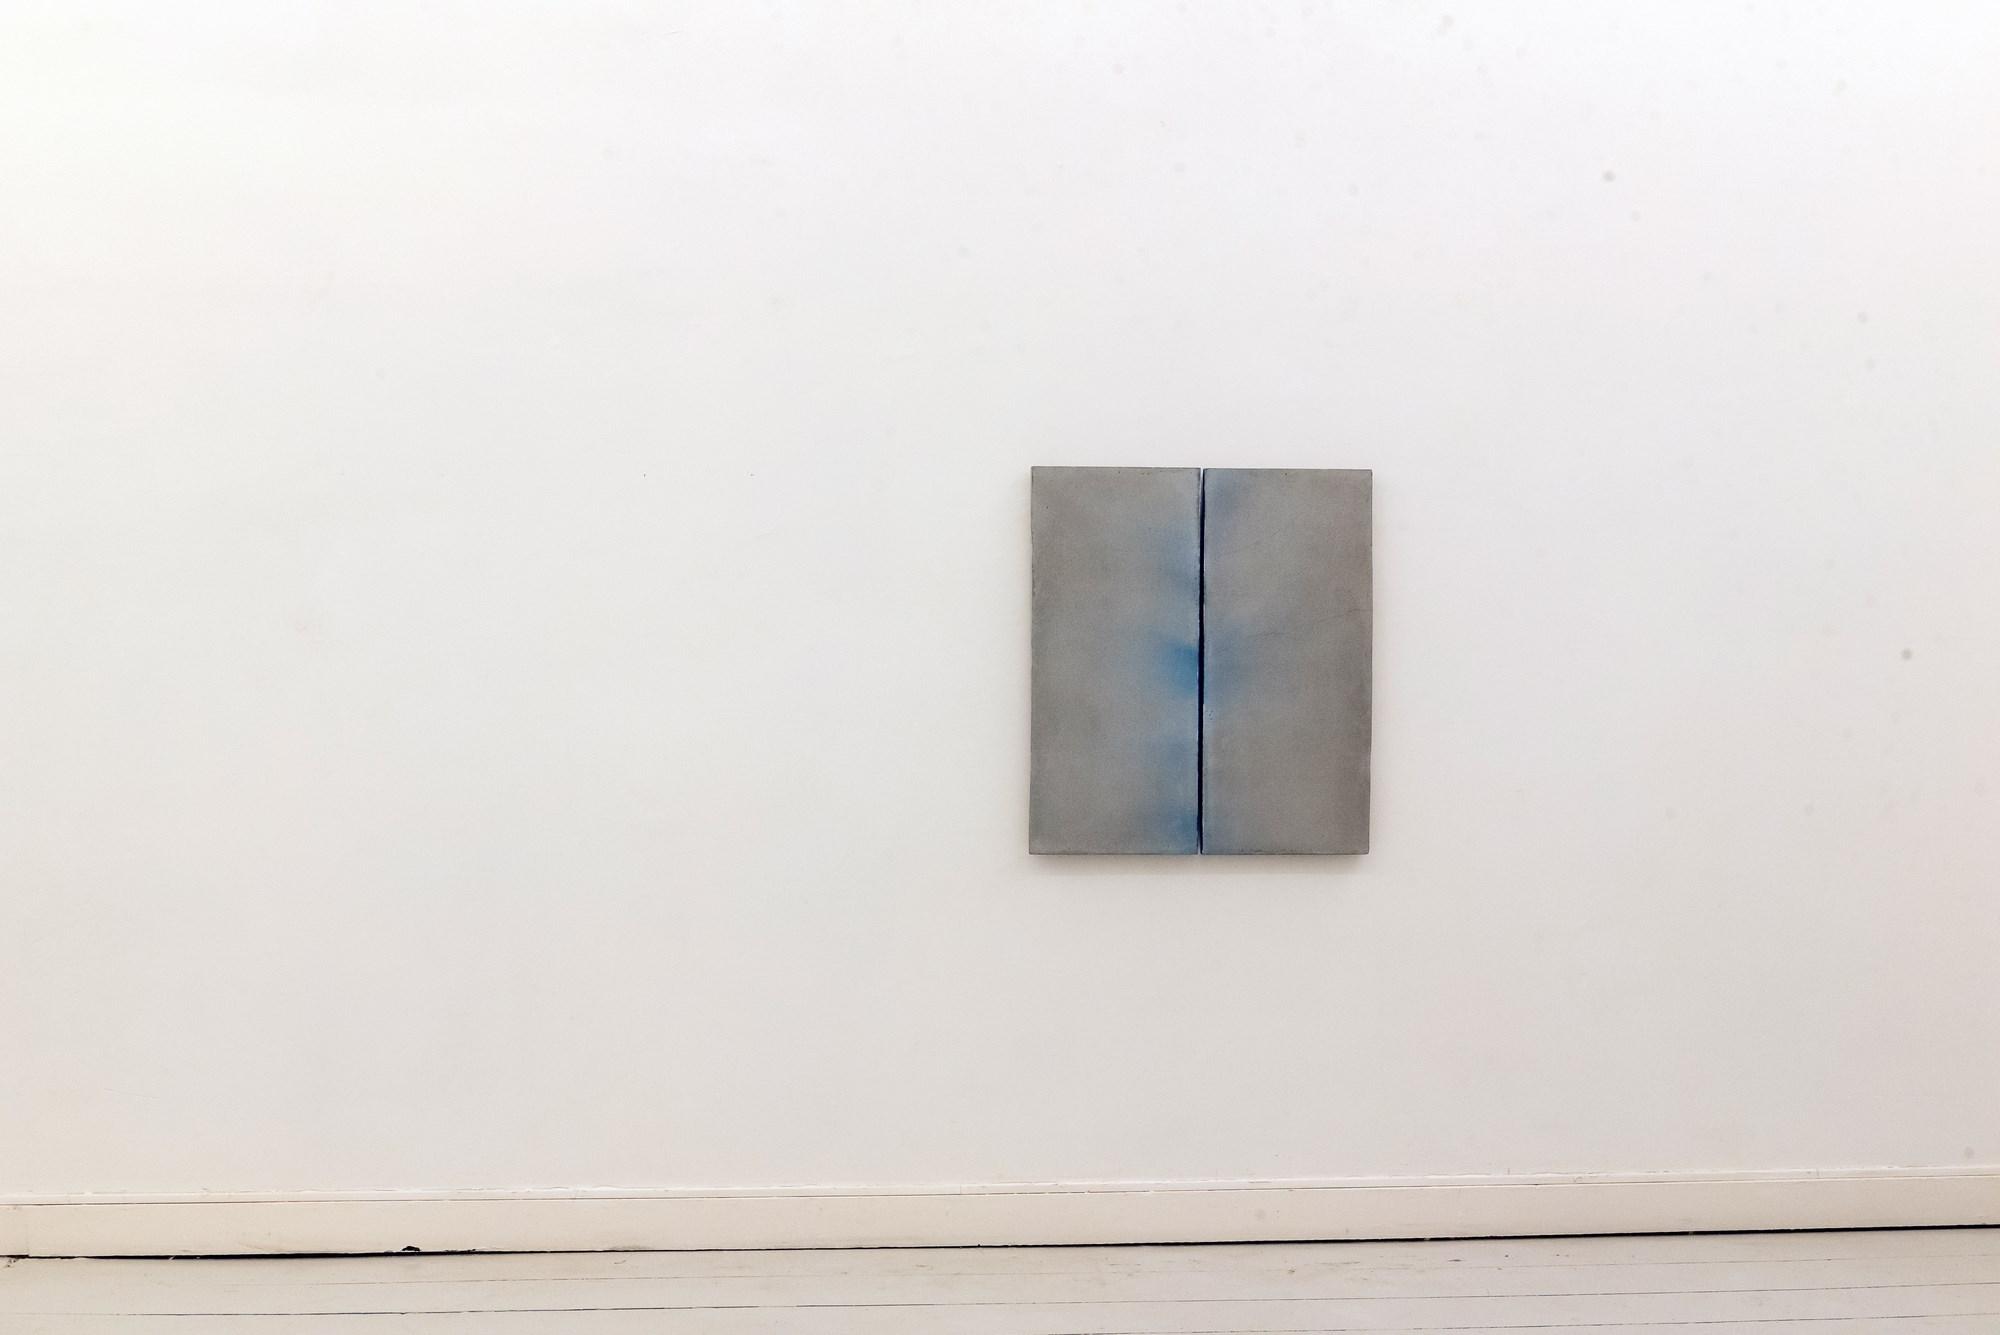 Ayrton Eblé - Geukens & De Vil